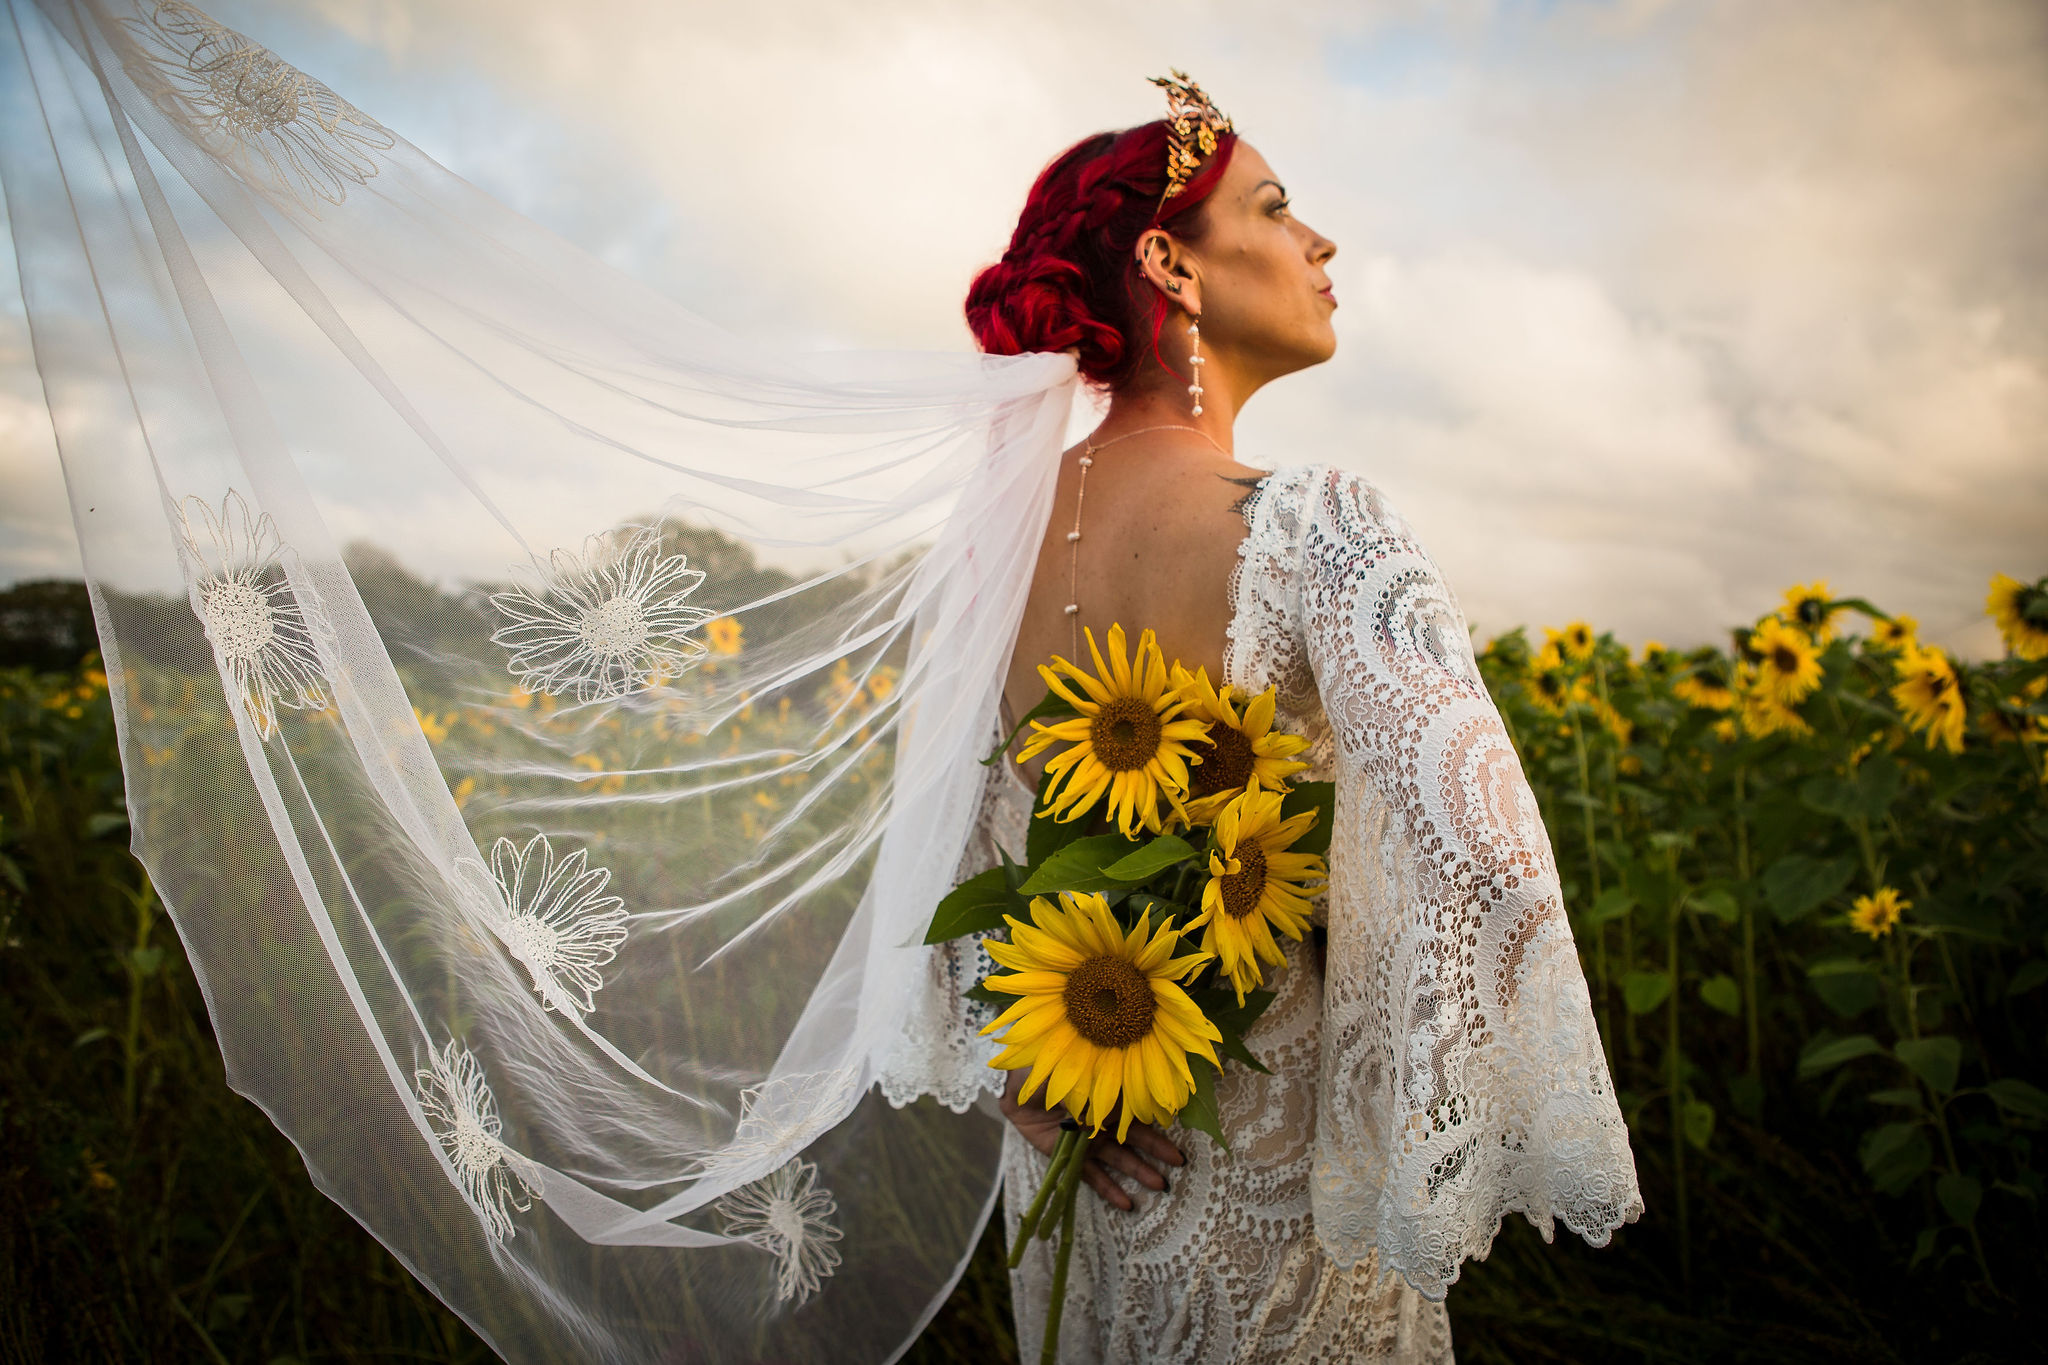 sunflower themed wedding - unconventional wedding - sunflower wedding - autumn wedding - alternative wedding planning - sunflower bridal veil